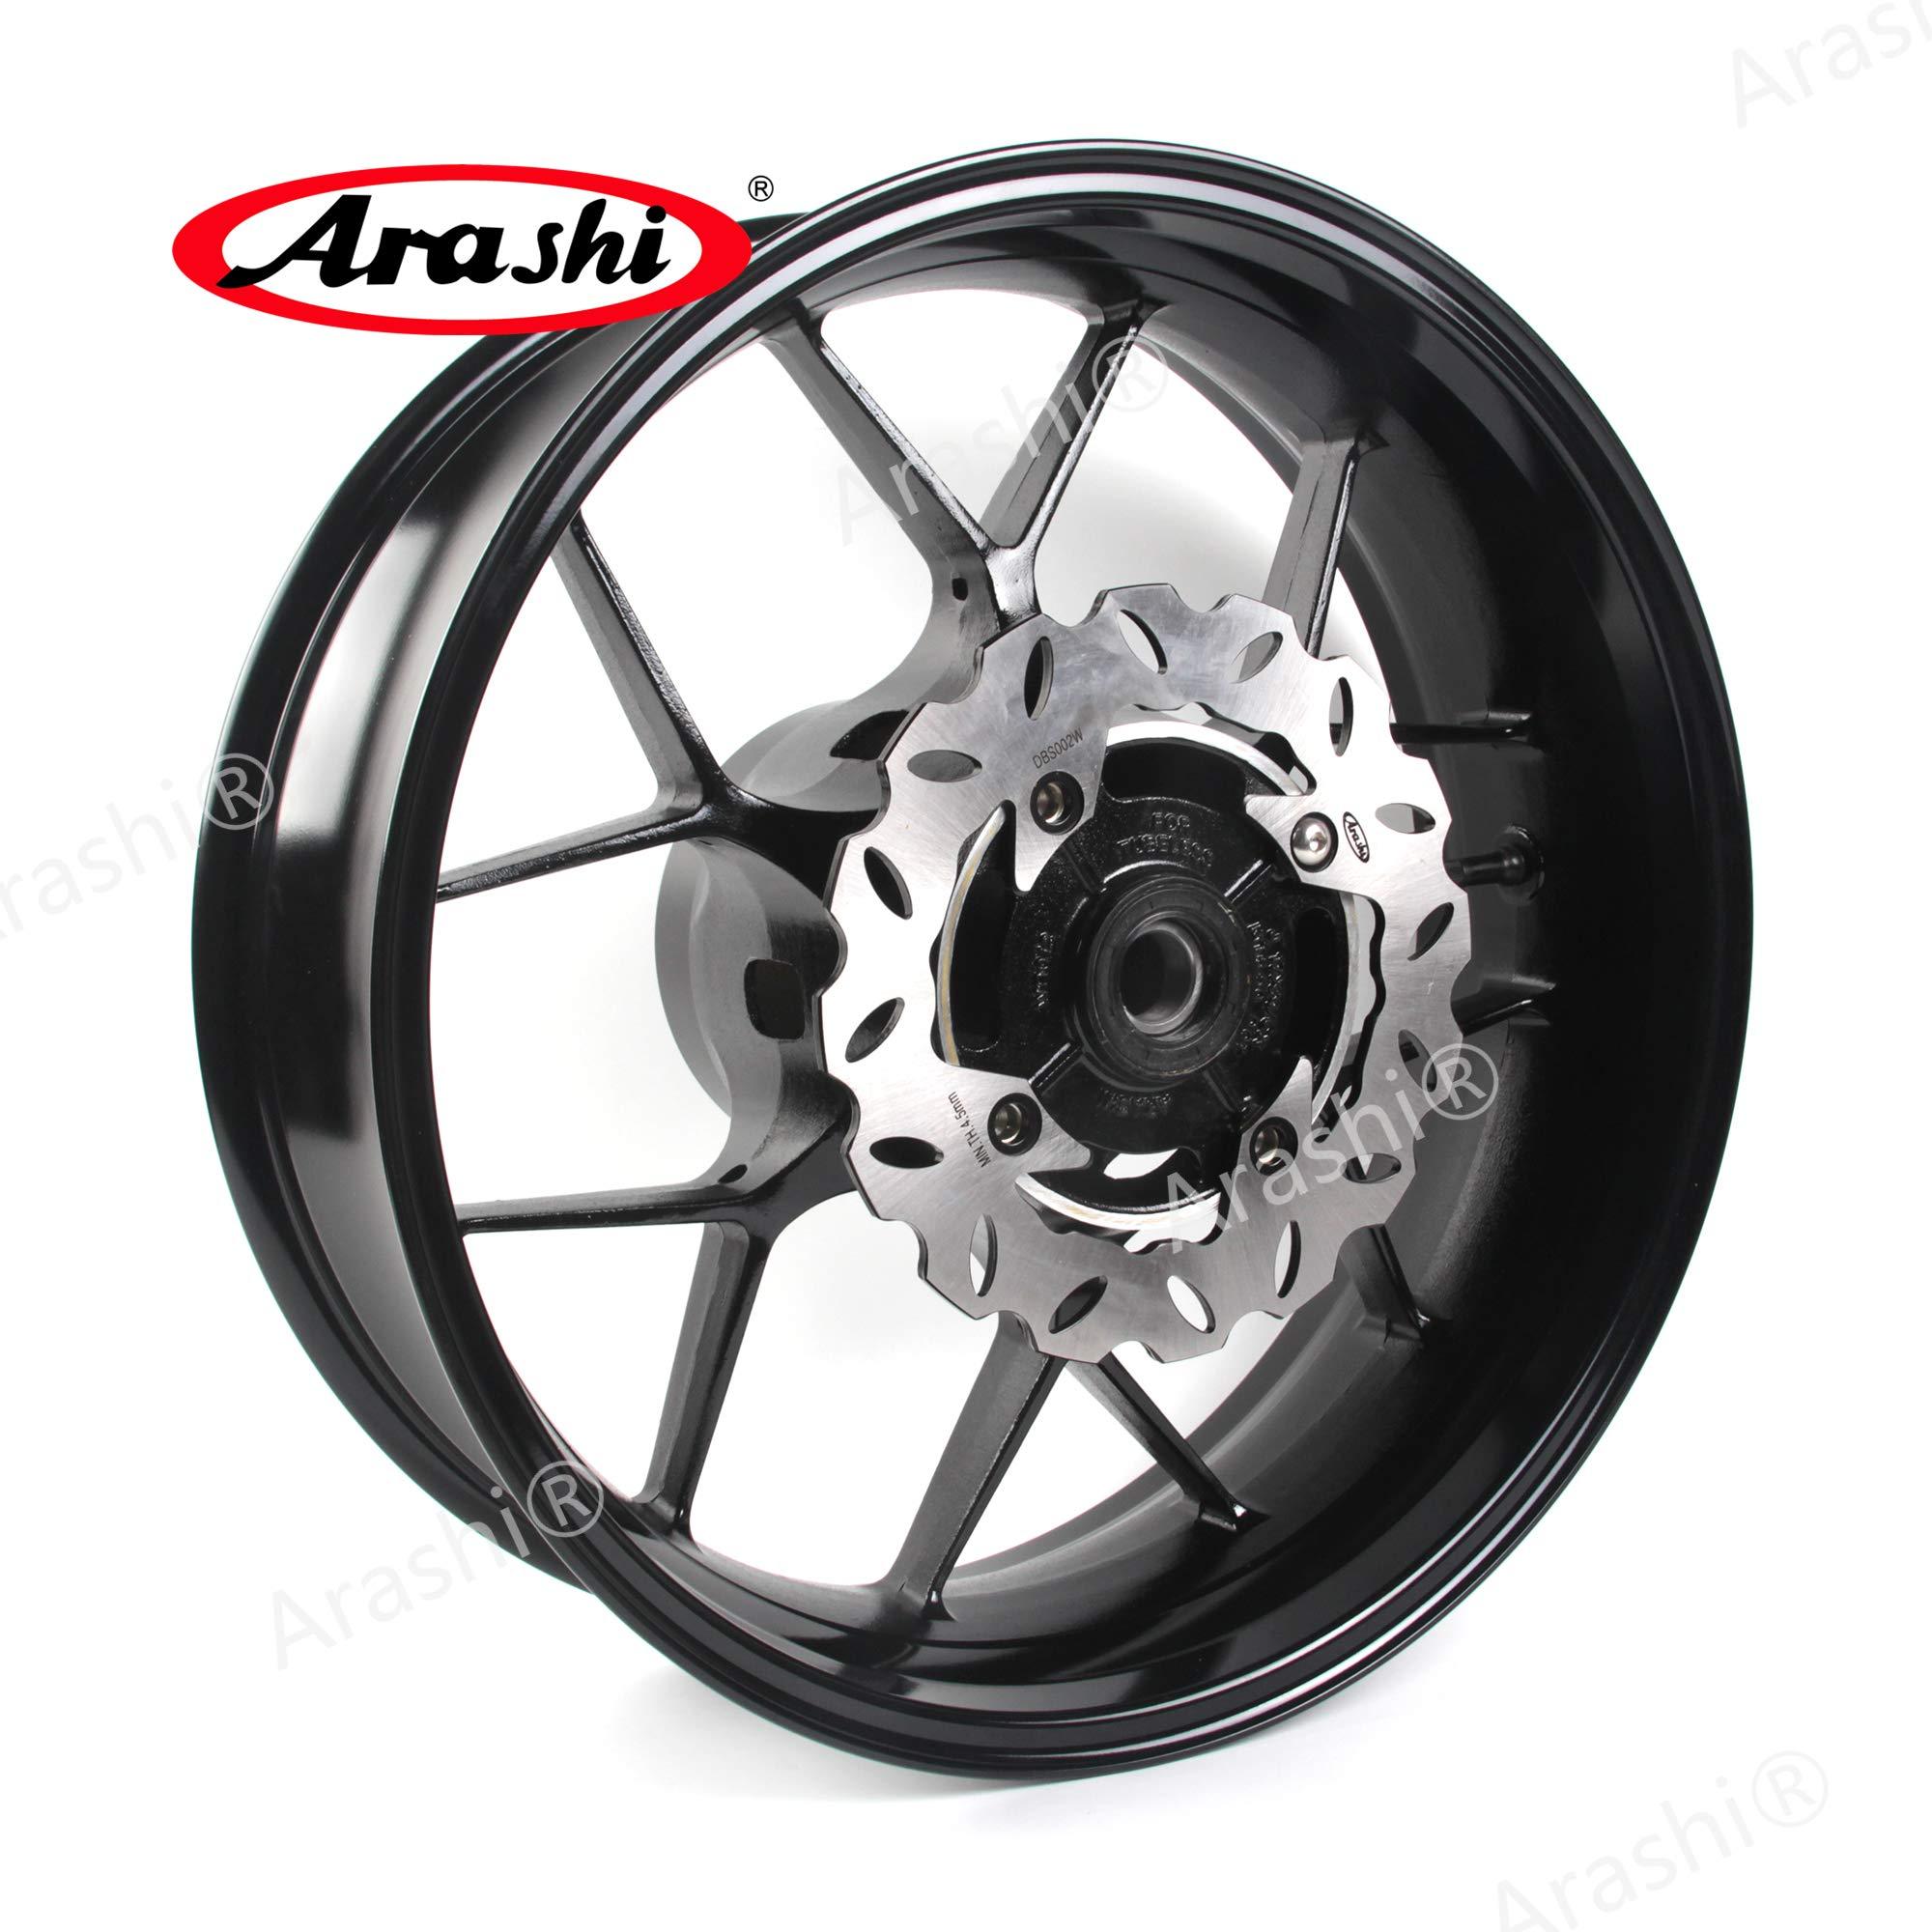 Arashi Rear Wheel Rim and Brake Rotor Disc Disk for HONDA CBR600RR 2007-2017 Motorcycle Accessories CBR 600 RR CBR600 600RR 600CC Black 2008 2009 2010 2011 2012 2013 2014 2015 2016